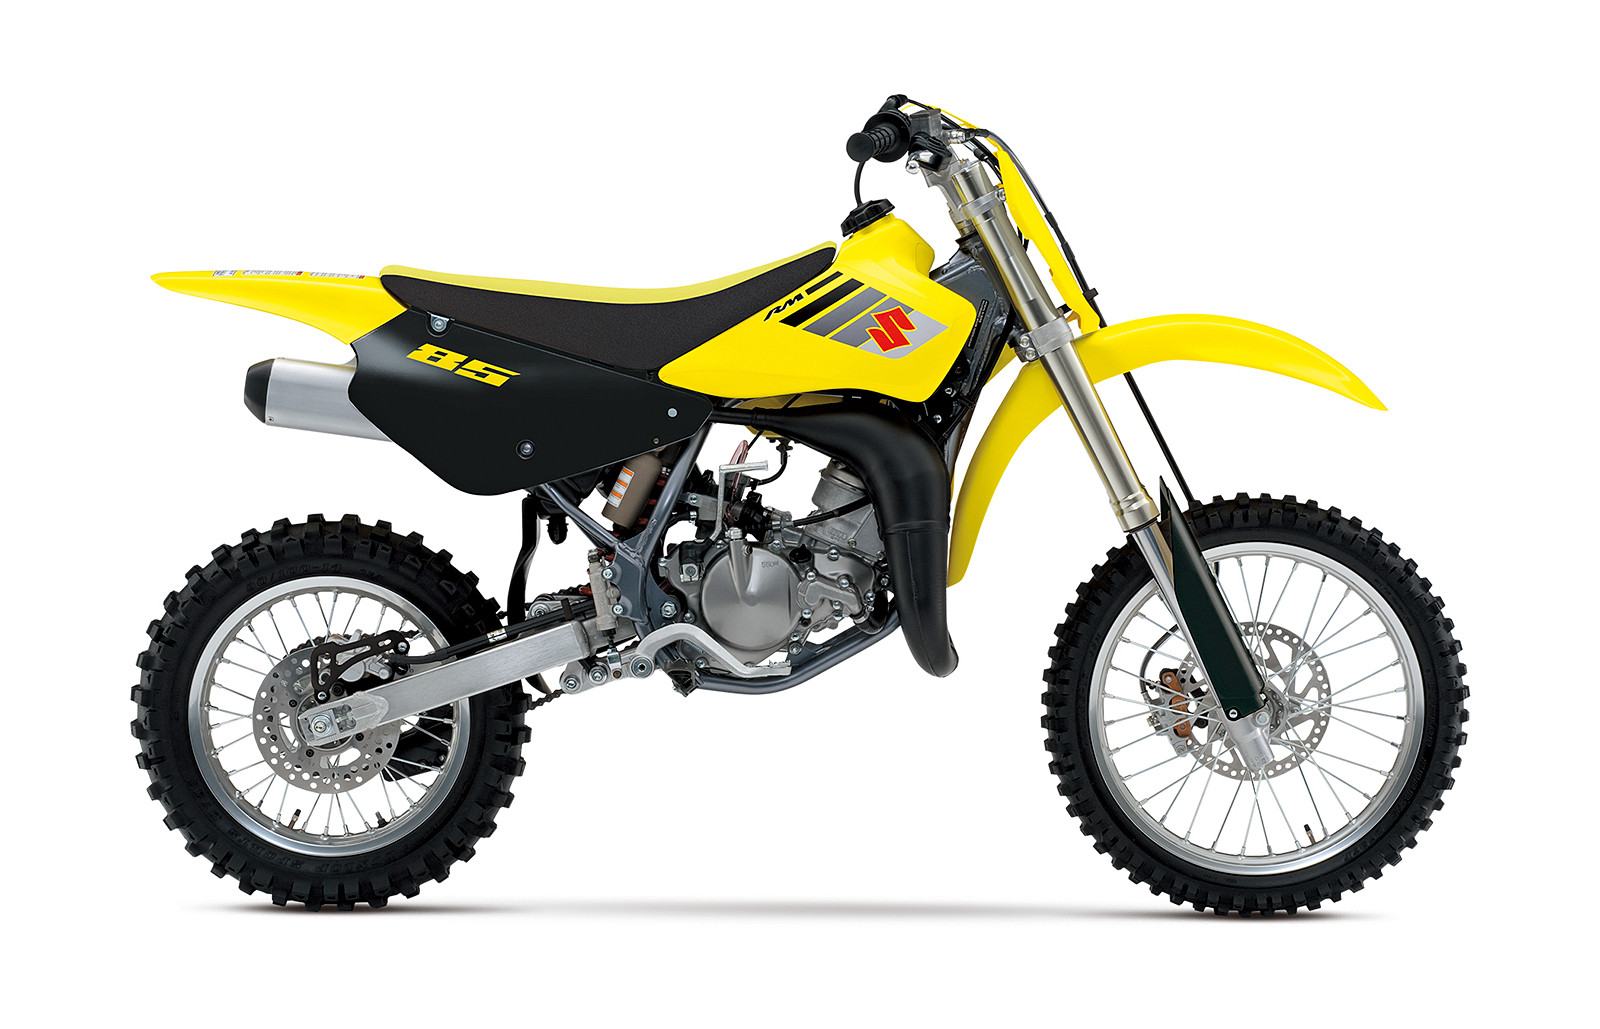 2017 Suzuki RM85 - First Look: 2017 Suzuki RM, RM-Z, and RMX Models - Motocross Pictures - Vital MX